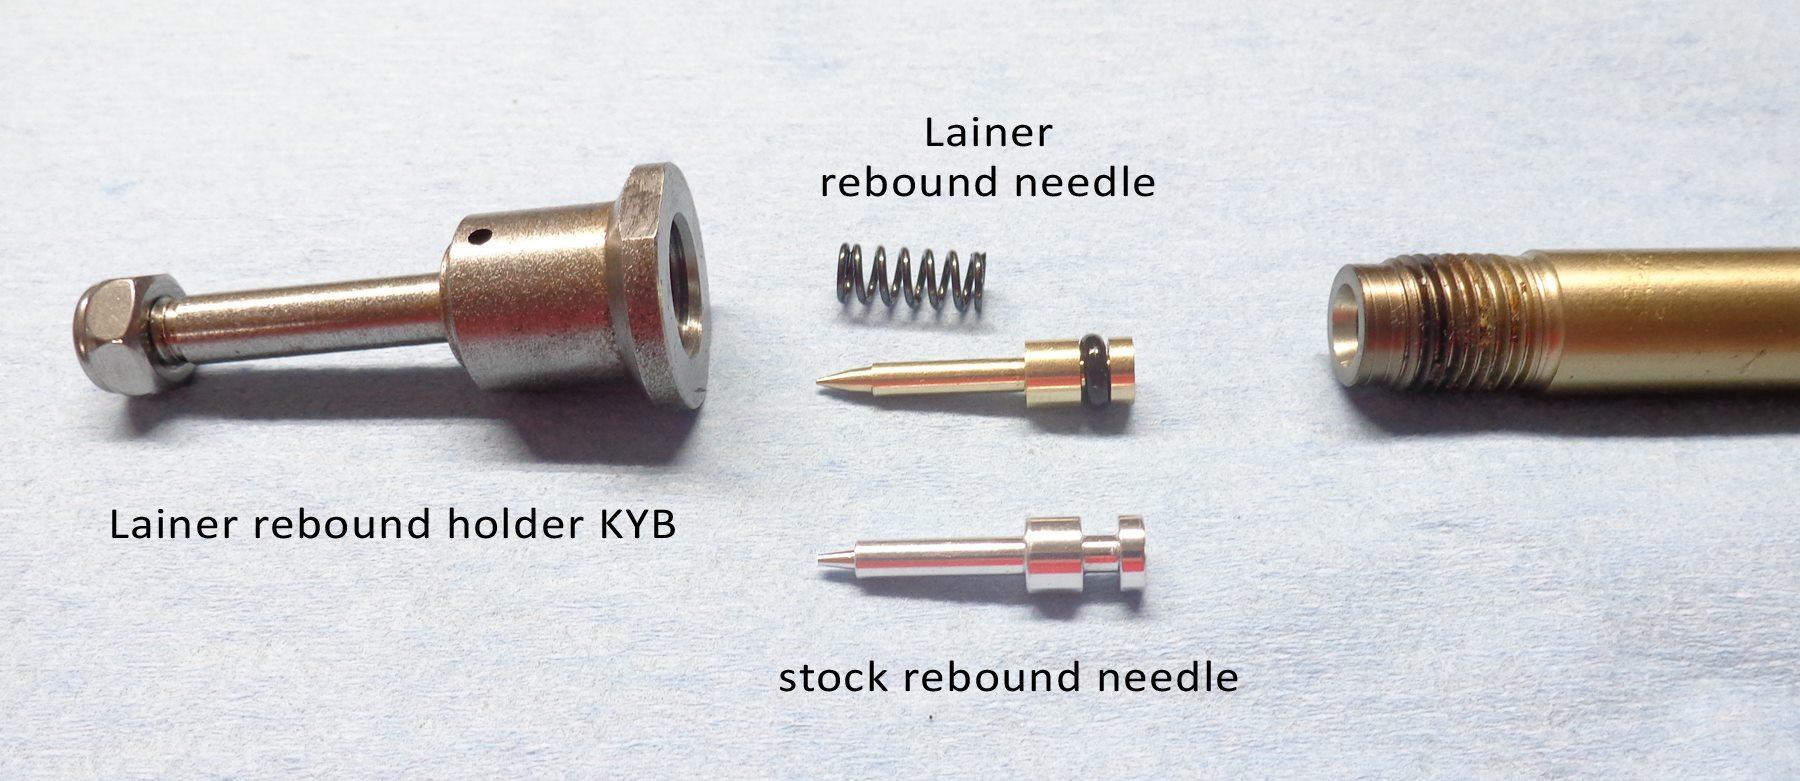 Rebound needle fork KYB (single)